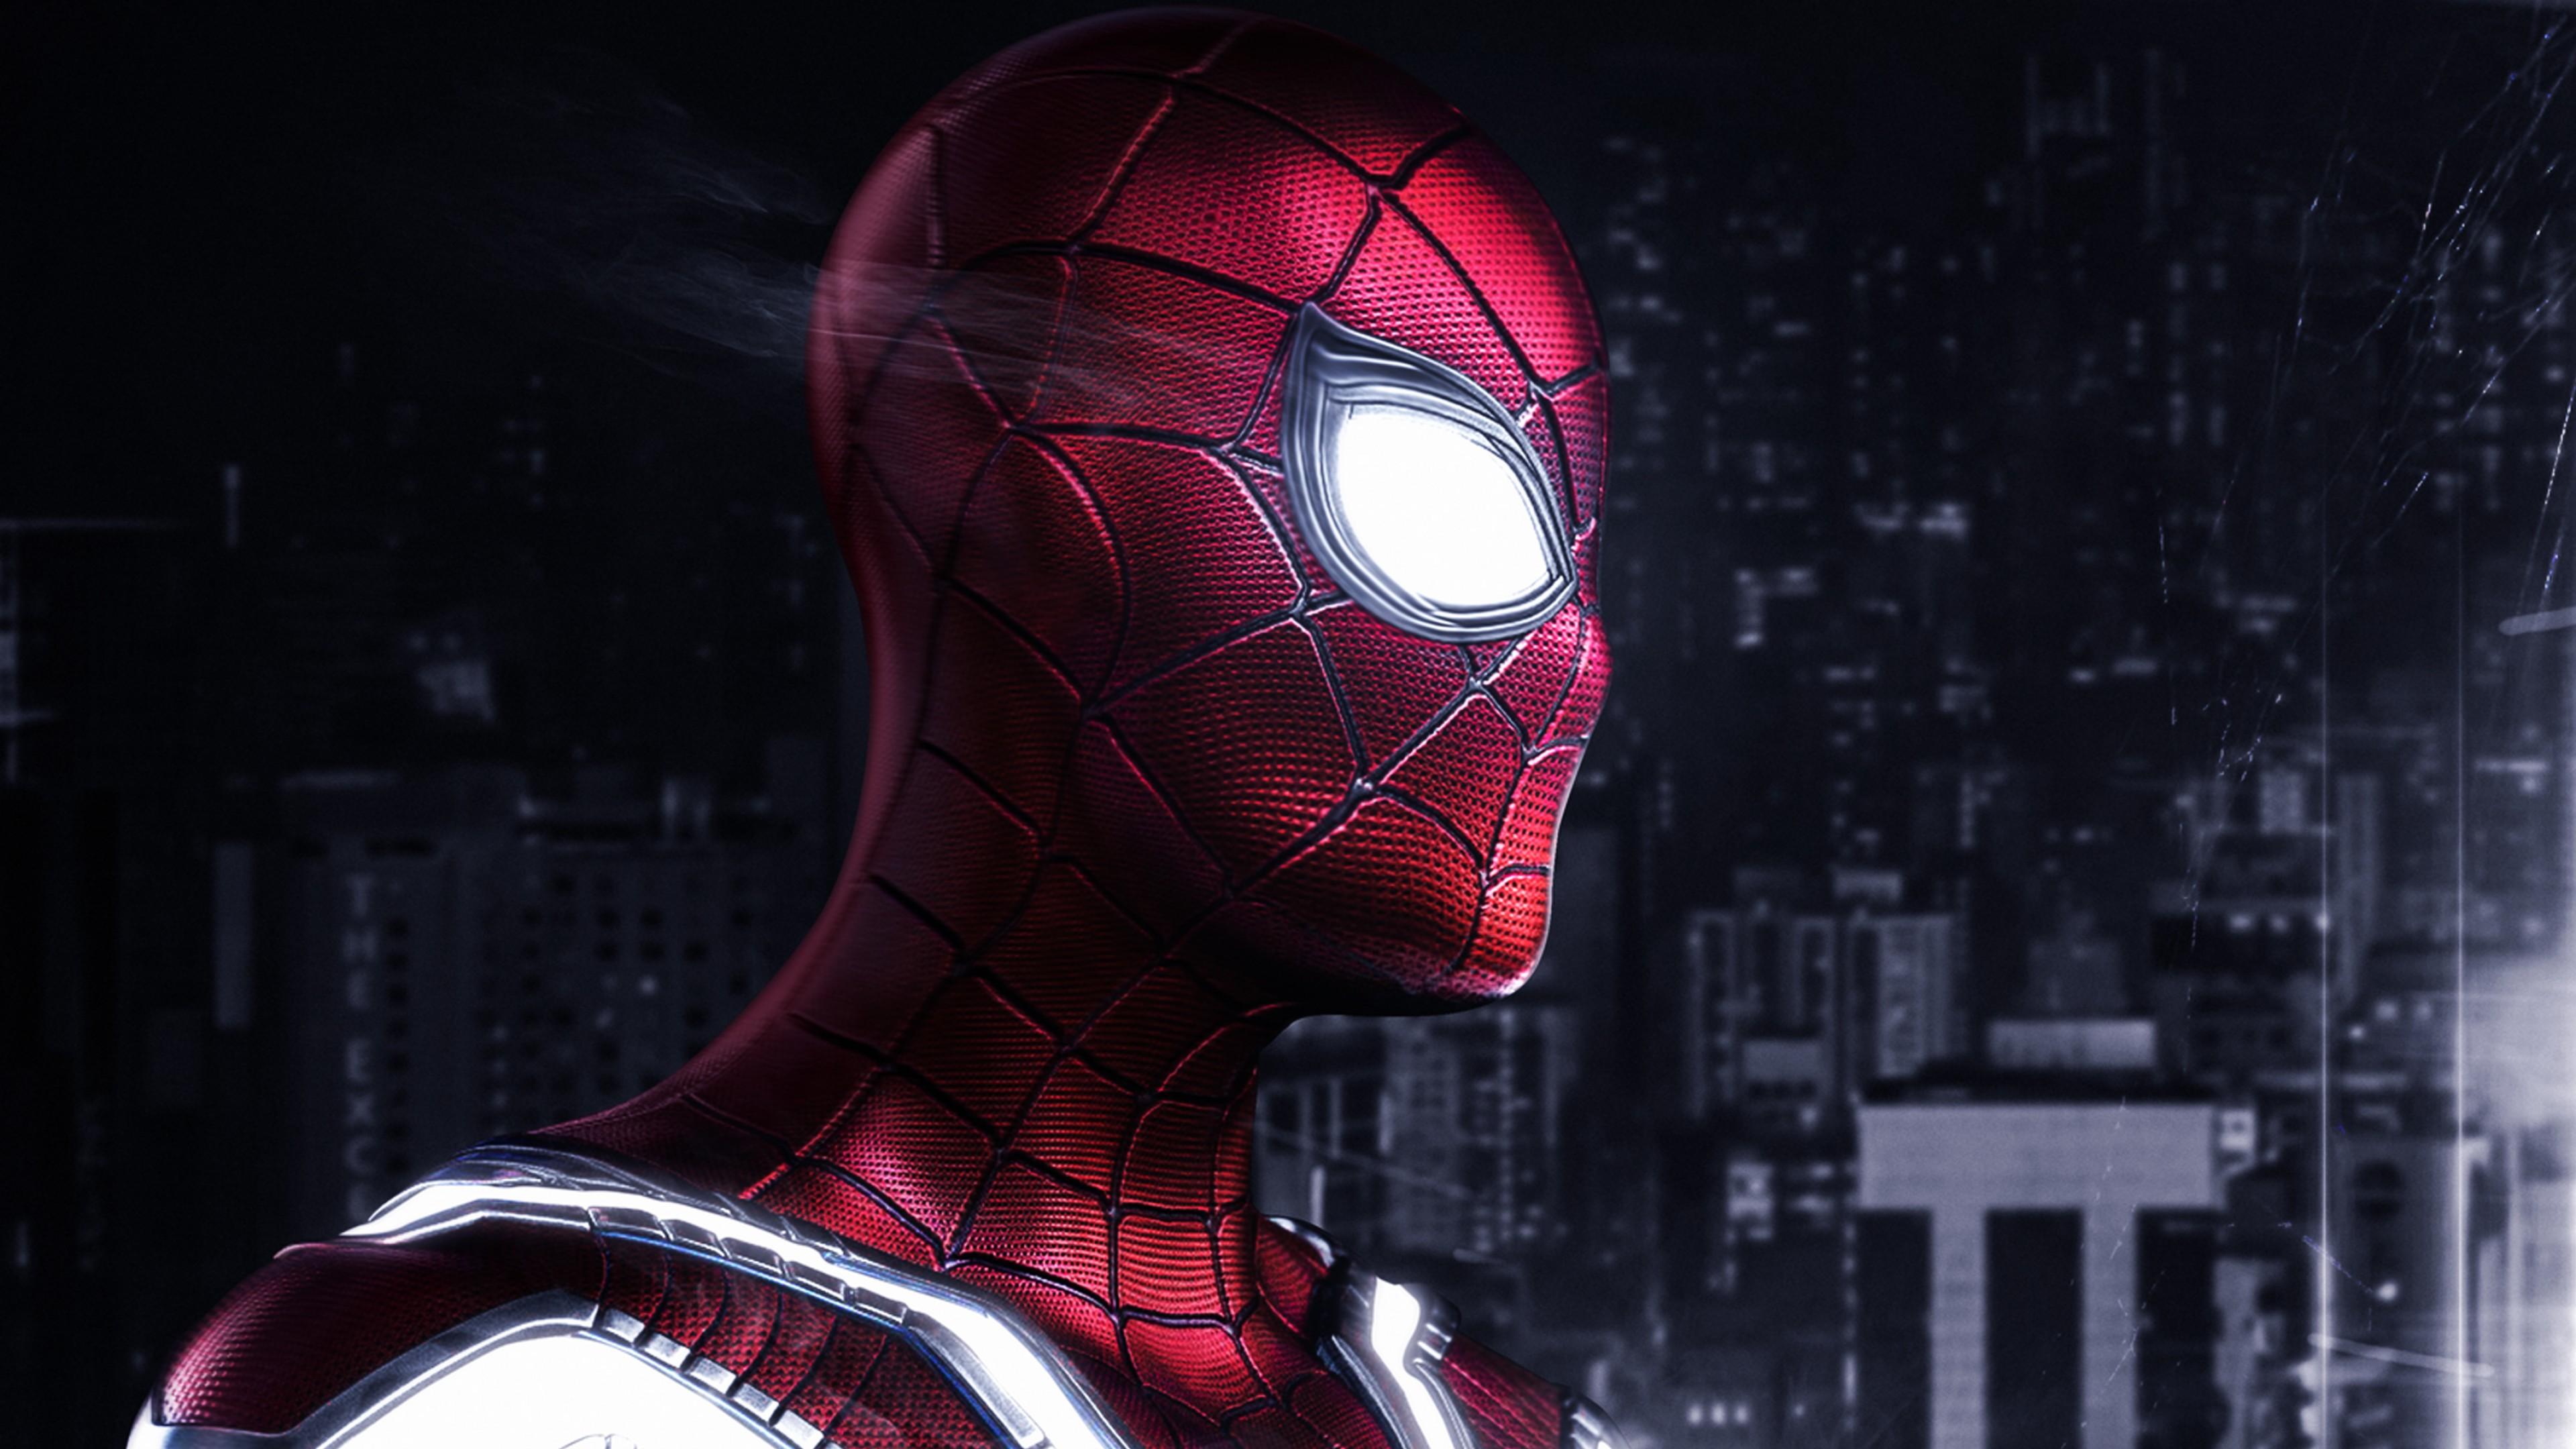 Iron man wallpaper 4k for pc | 4K Ultra HD Iron man